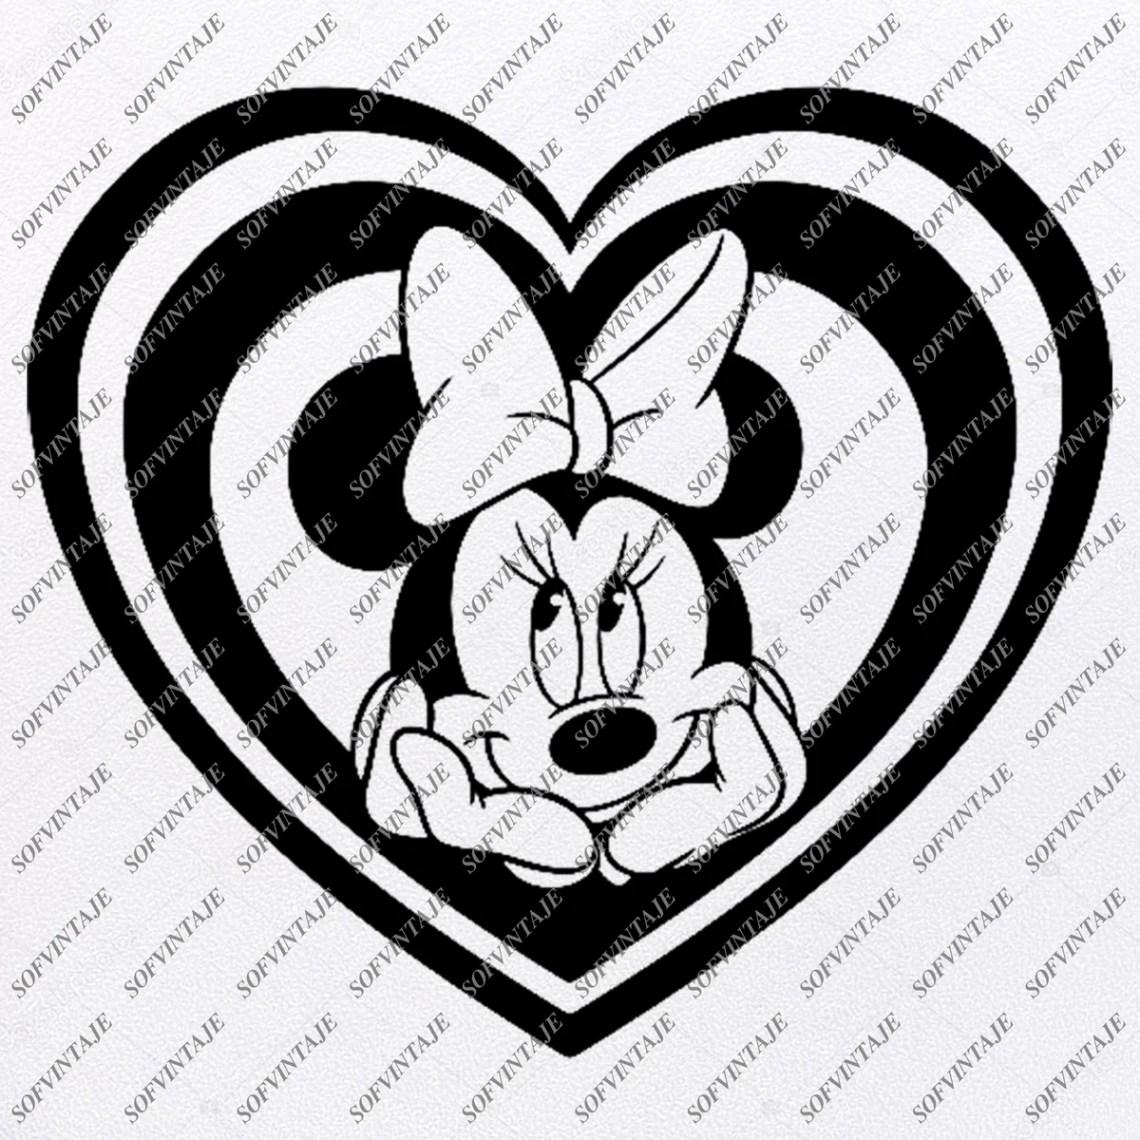 Download Disney Svg File - Minnie Mause Heart Svg - Minnie Mause ...